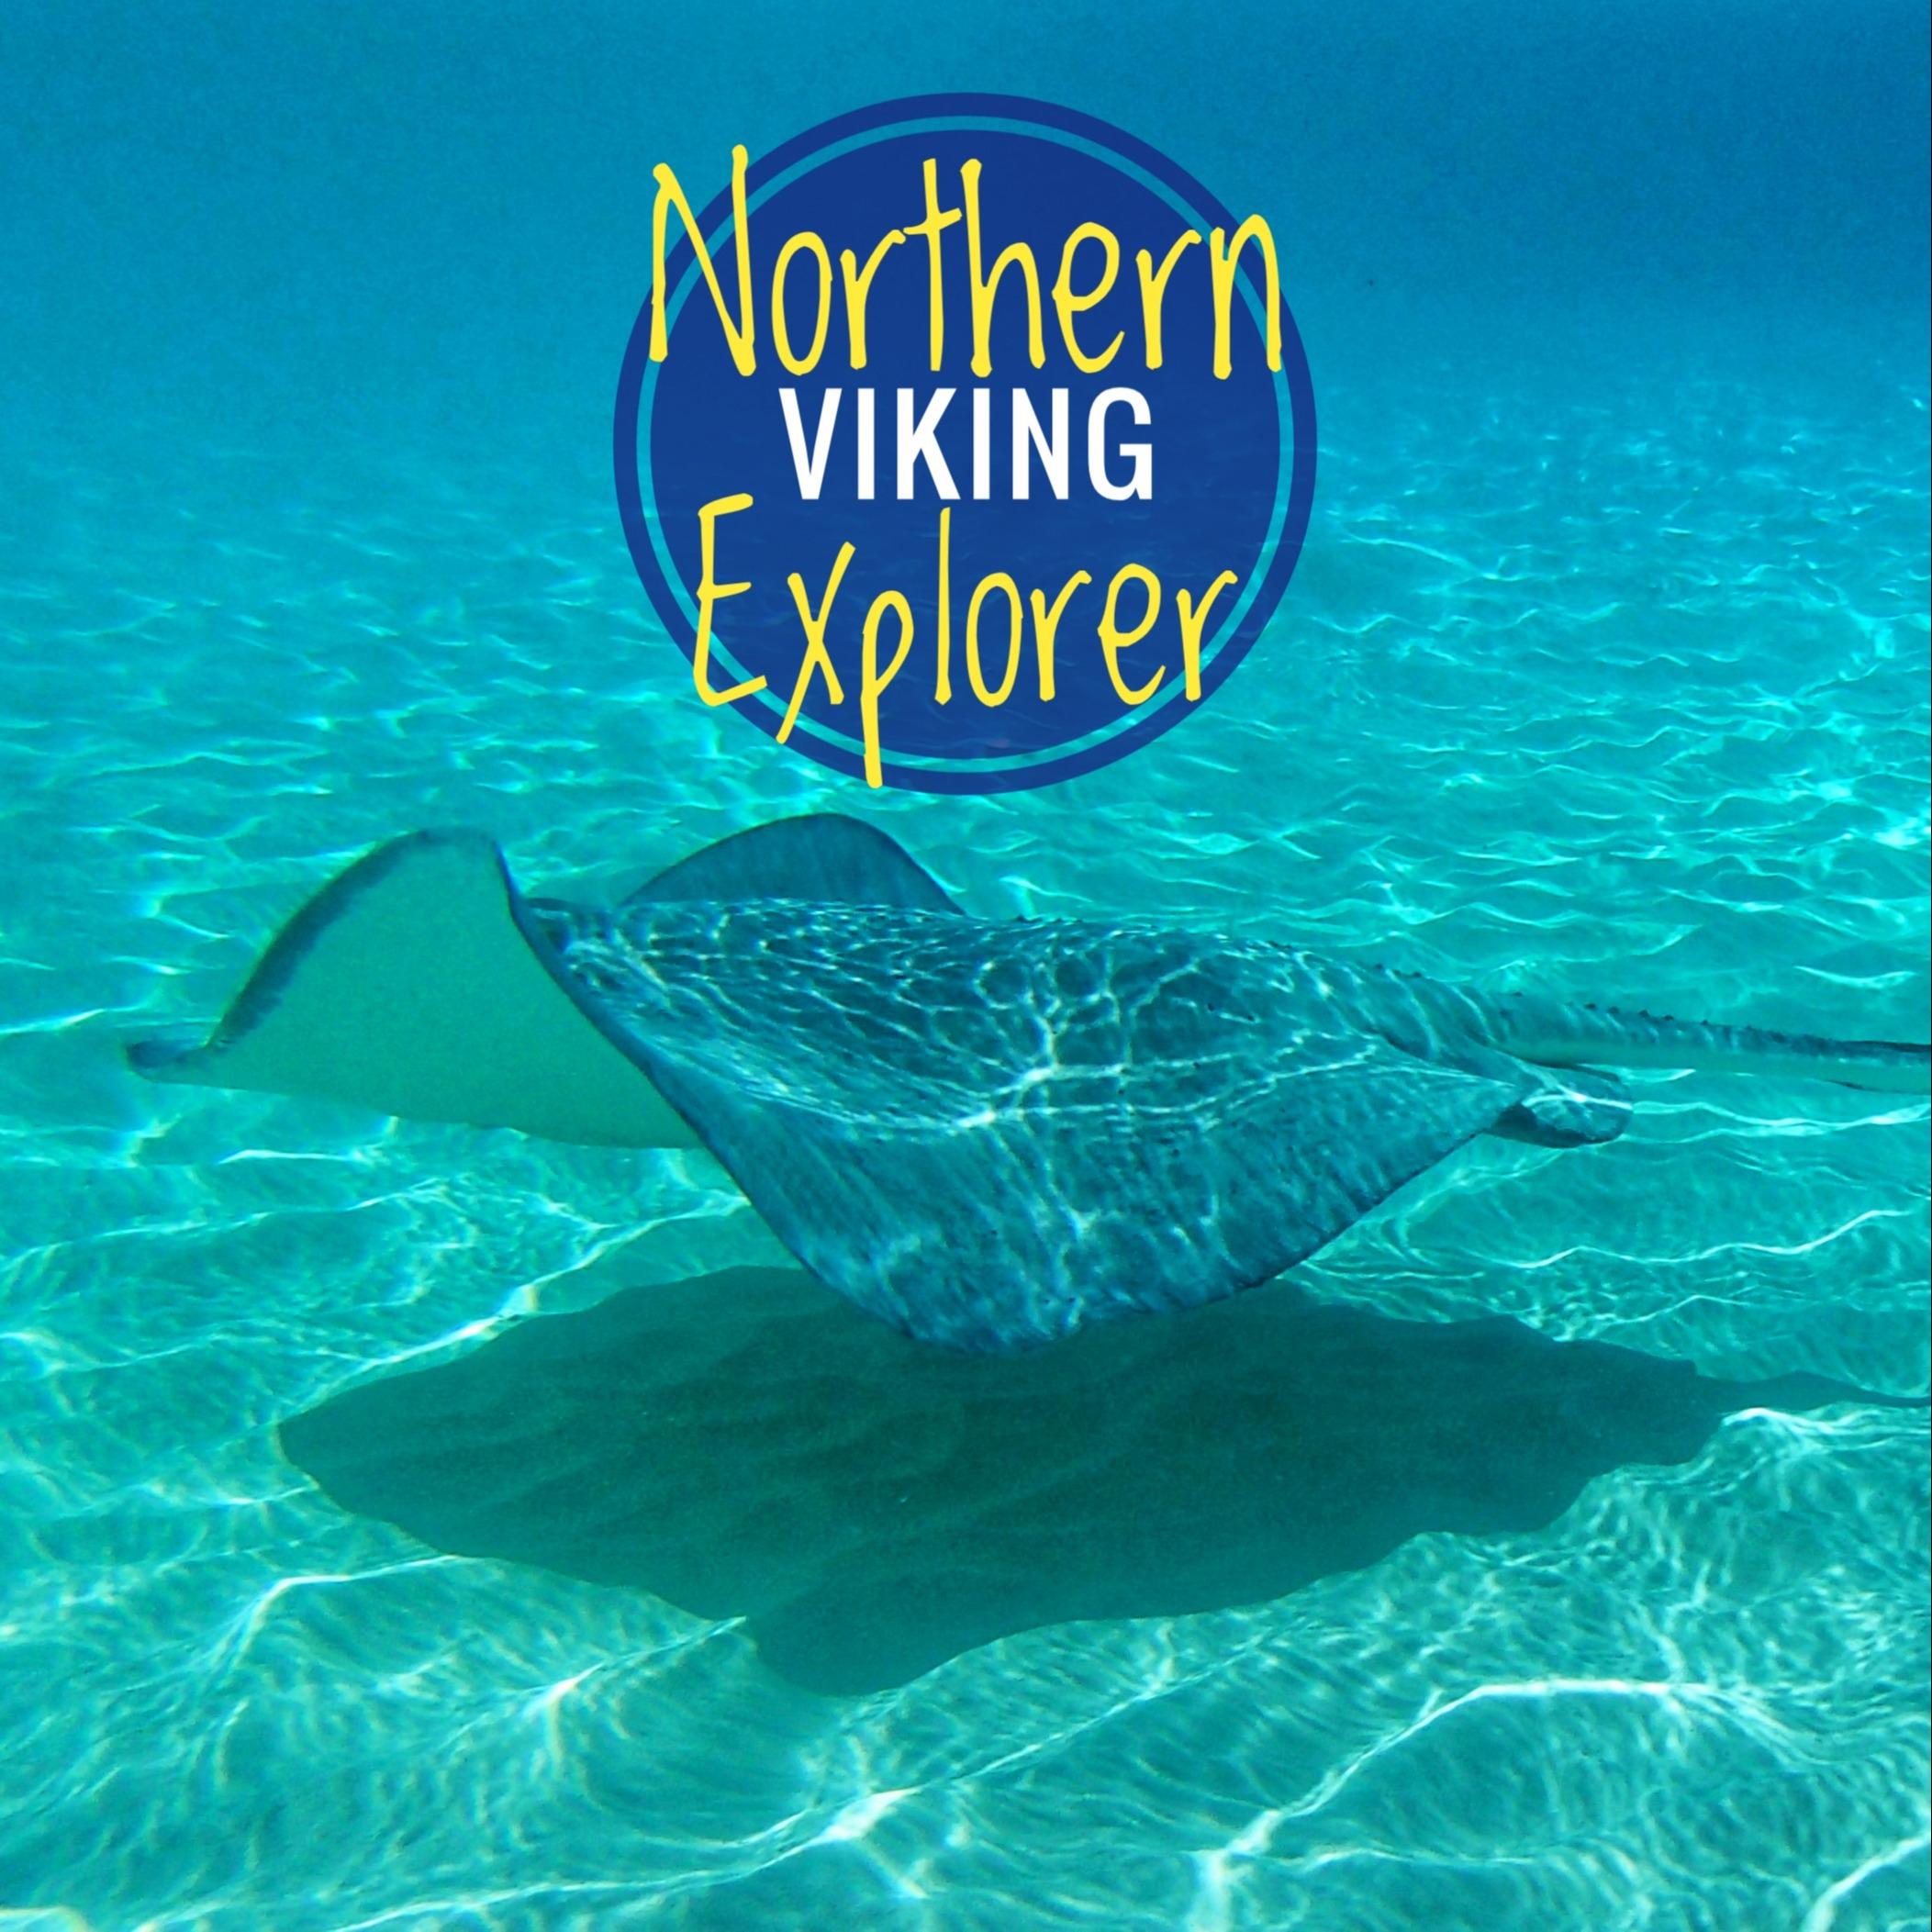 @NorthernVikingExplorer Profile Image | Linktree